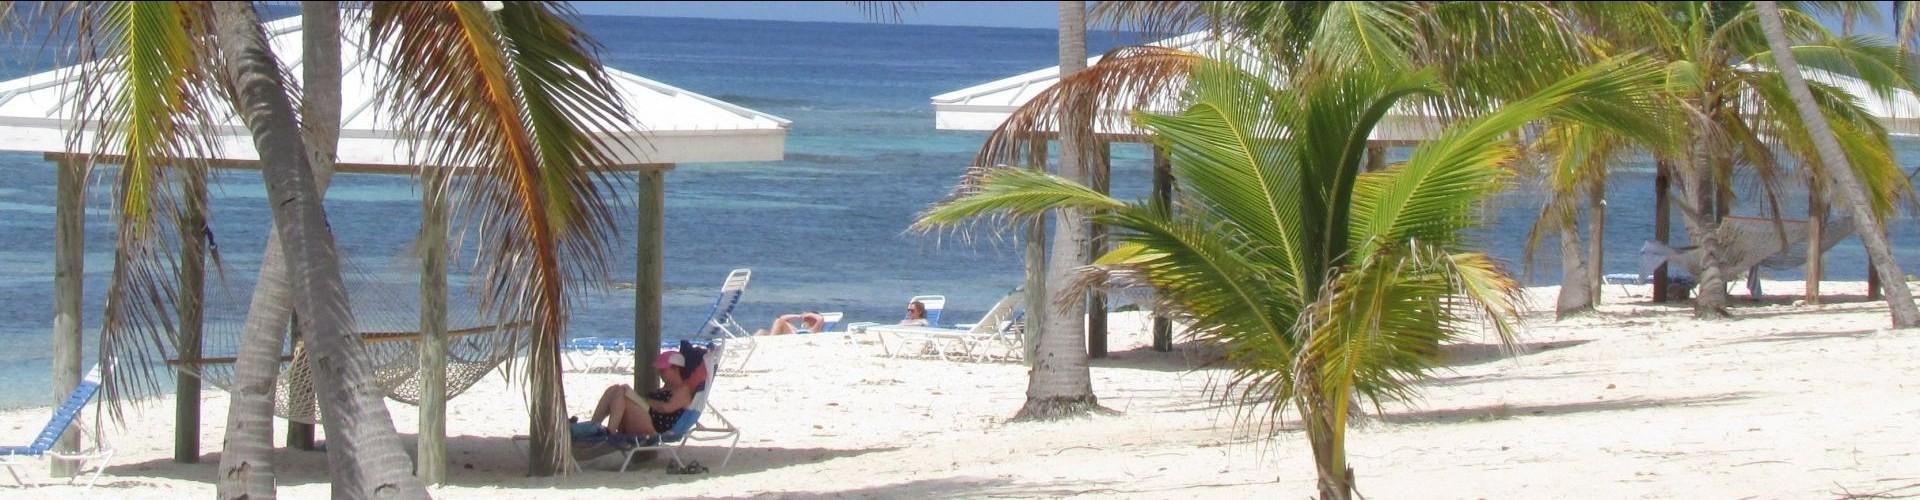 1 - Cayman Brac